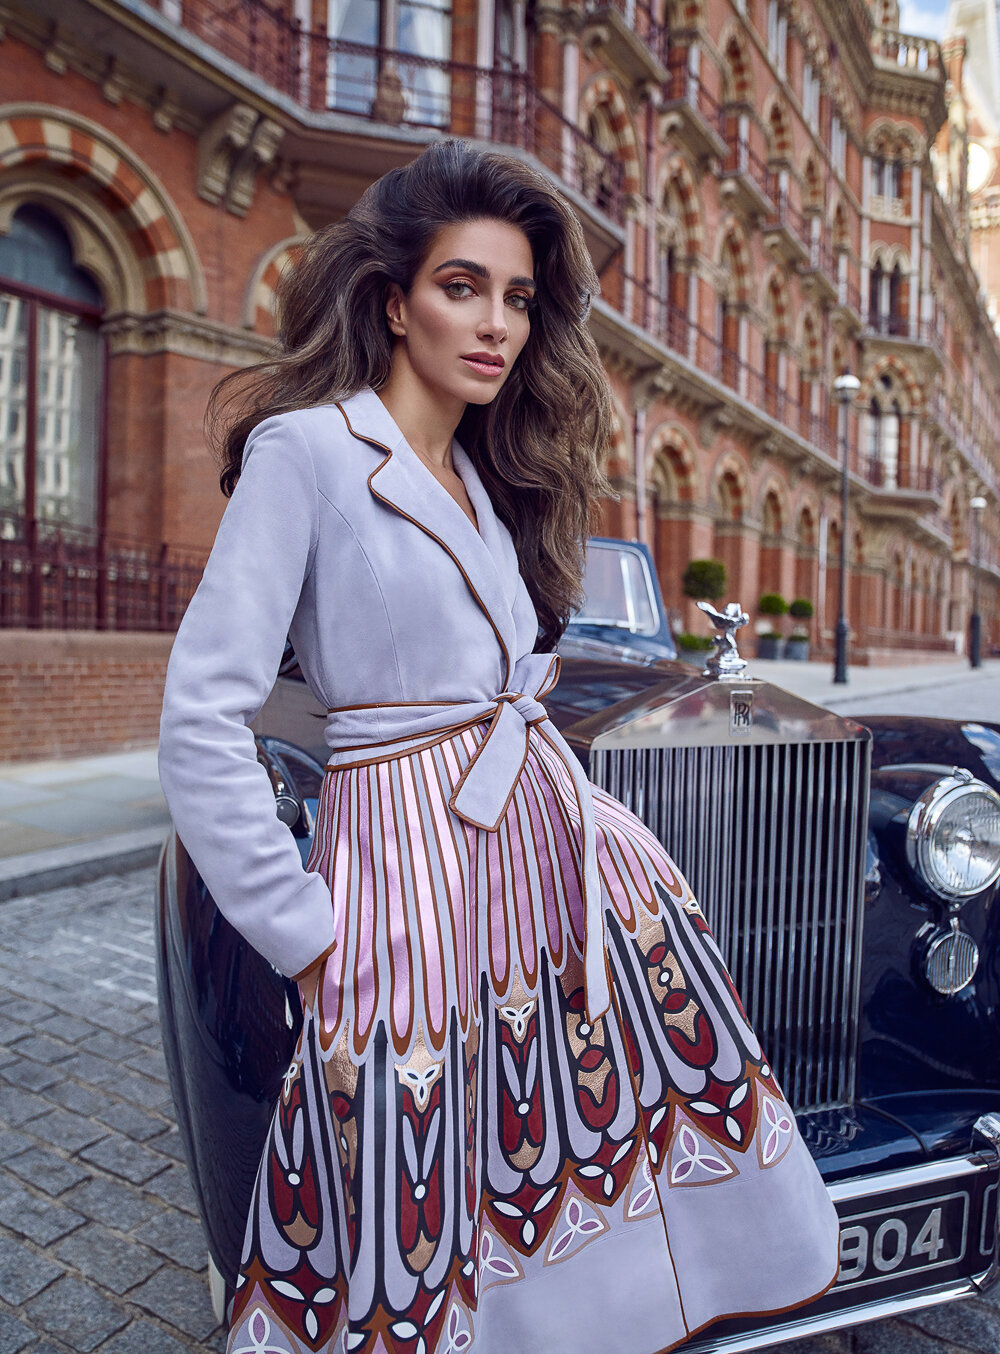 Luis-Monteiro-Harpers-Bazaar-Jessica-Kahawaty- (11).jpg